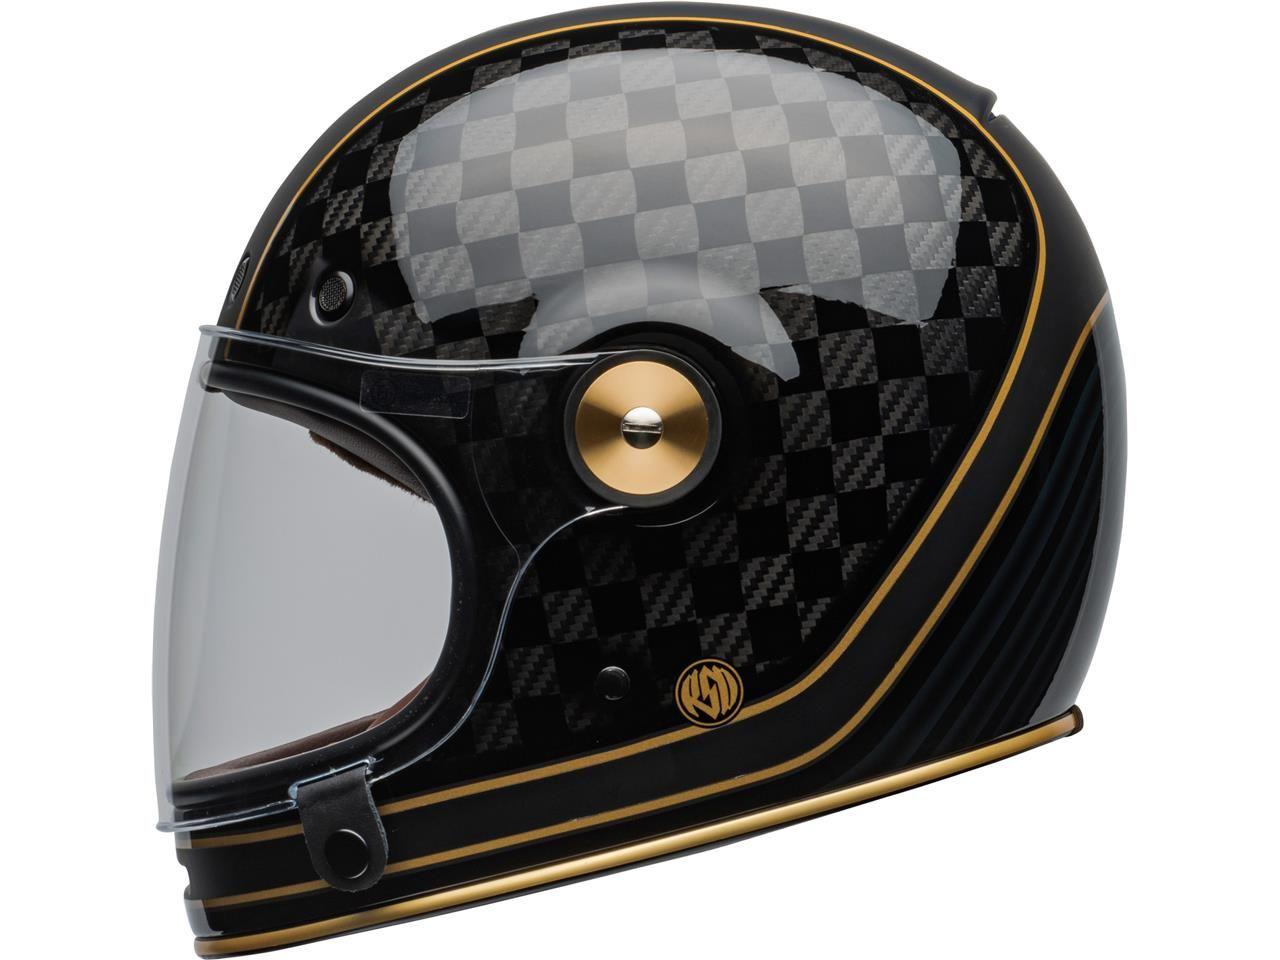 Bell Bullitt Carbon Rsd Check It Ece Full Face Helmets Helmet Roland Sands Design